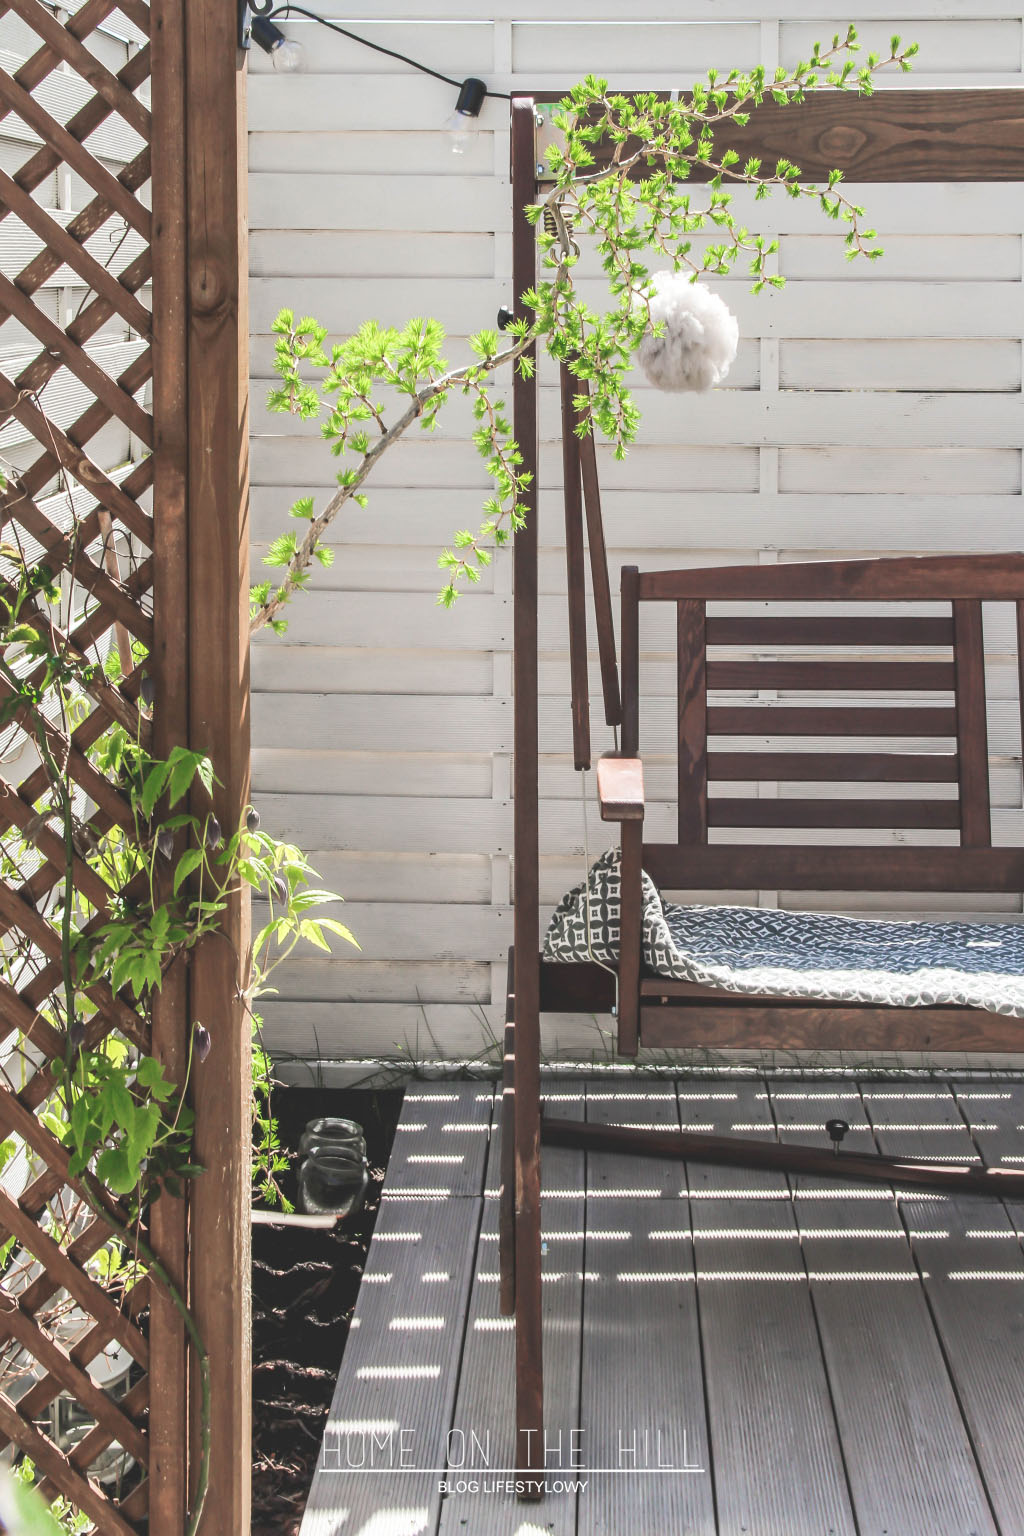 Maly Ogrodek Przydomowy Home On The Hill Blog Lifestylowy